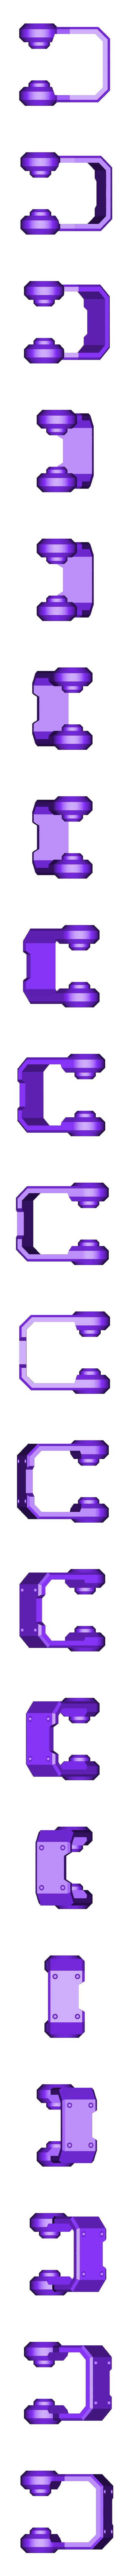 LegT1_Right_11_OliveGreen.stl Download STL file Heavy Gun Walker • 3D print design, Jwoong